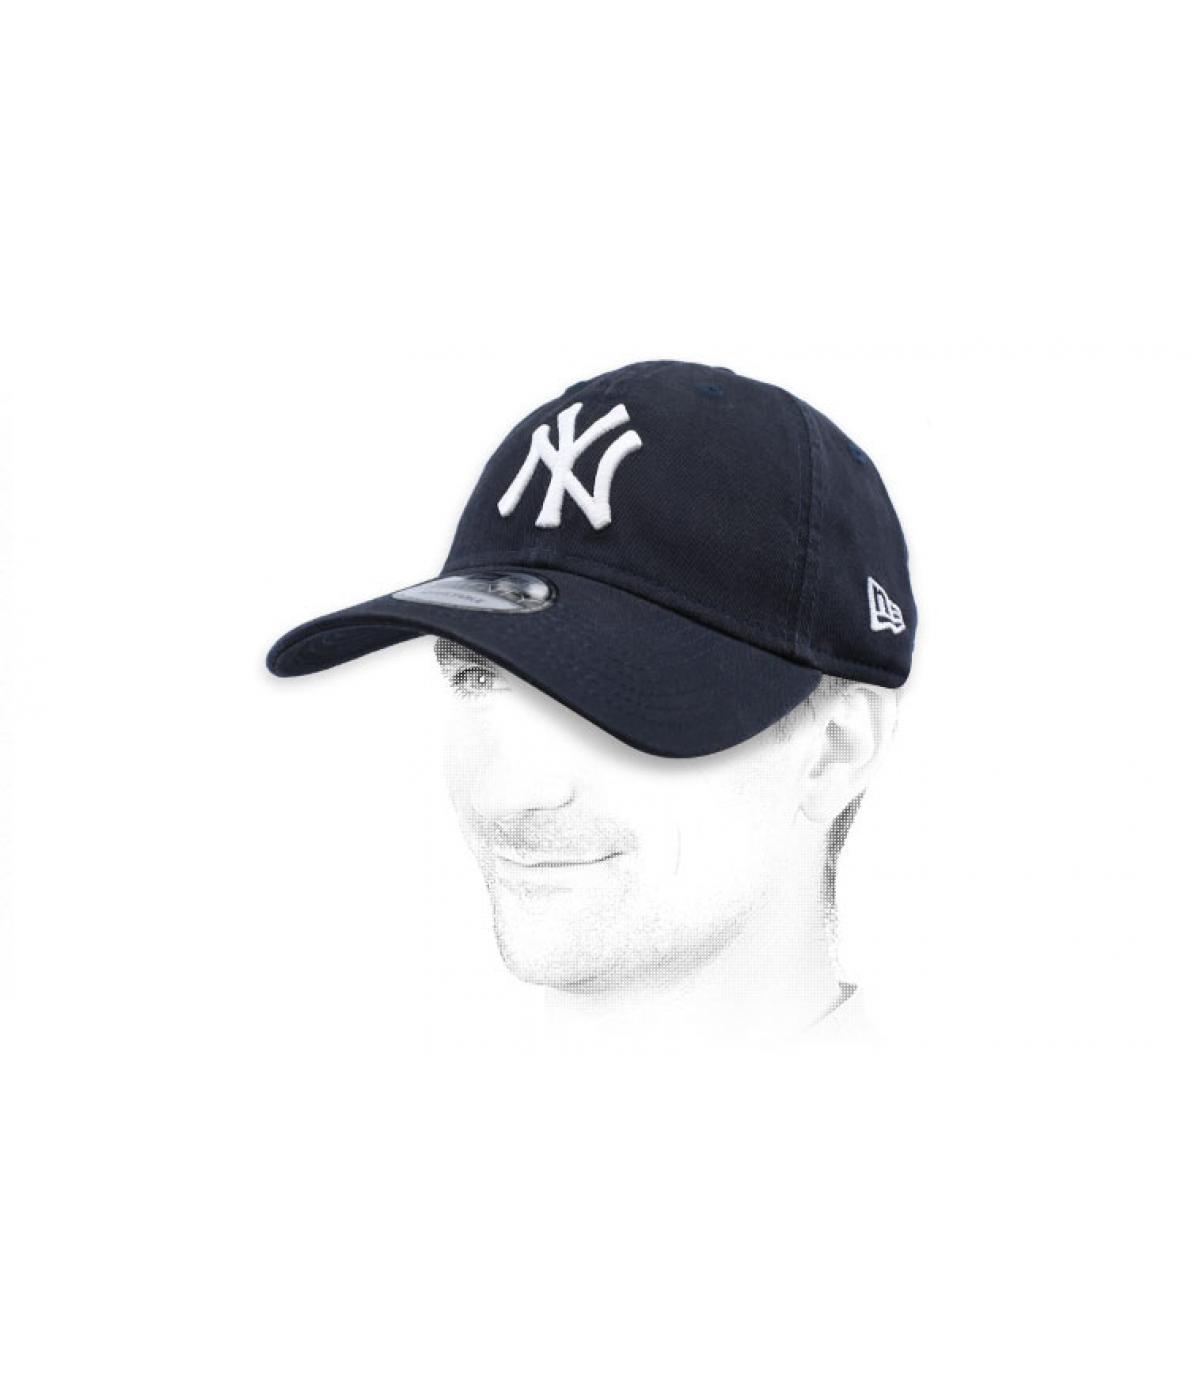 berretto NY blu bianco